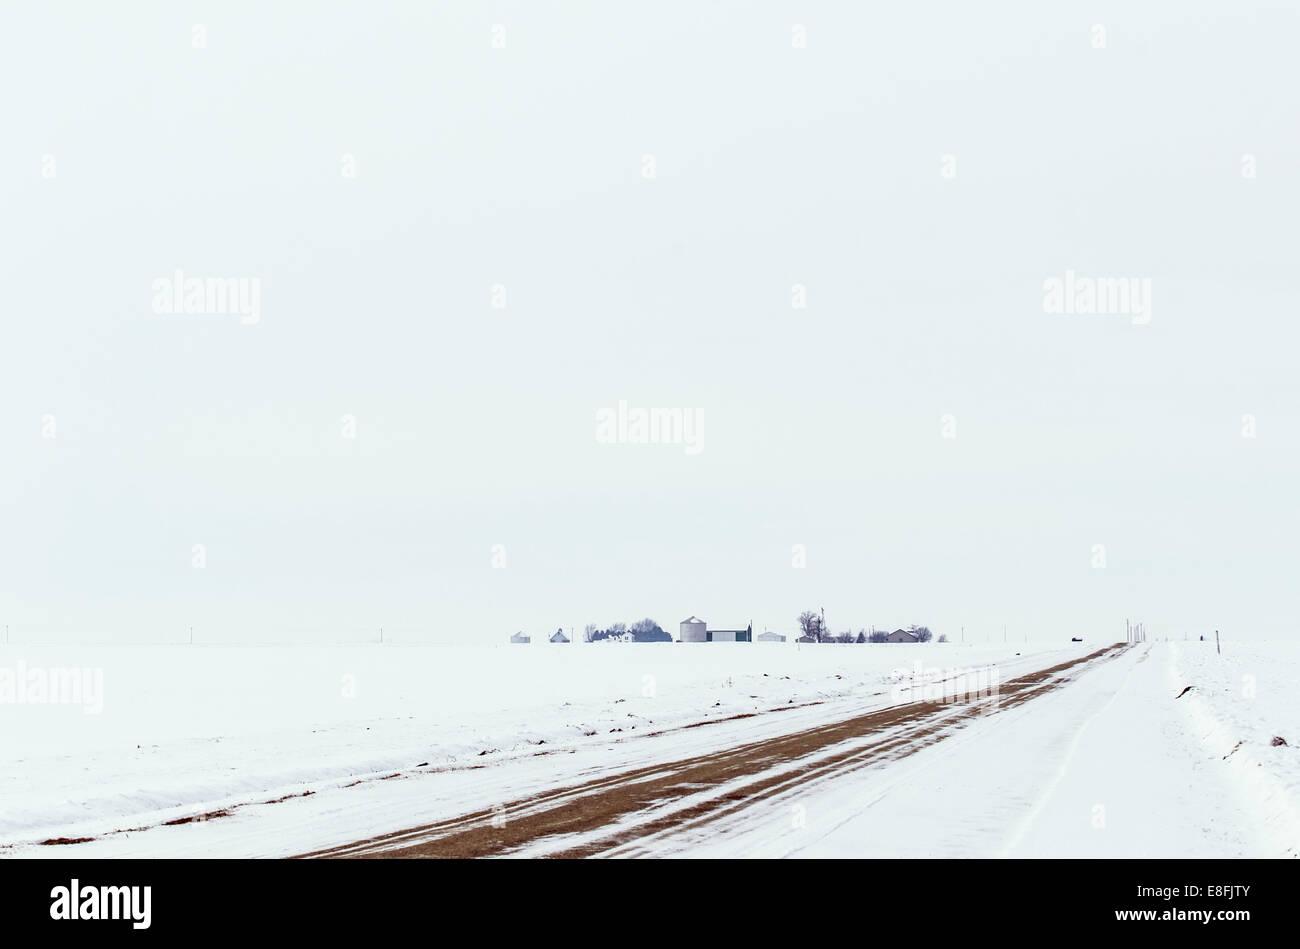 USA, Illinois, Iroquois County, Gilman, Rural winter landscape - Stock Image